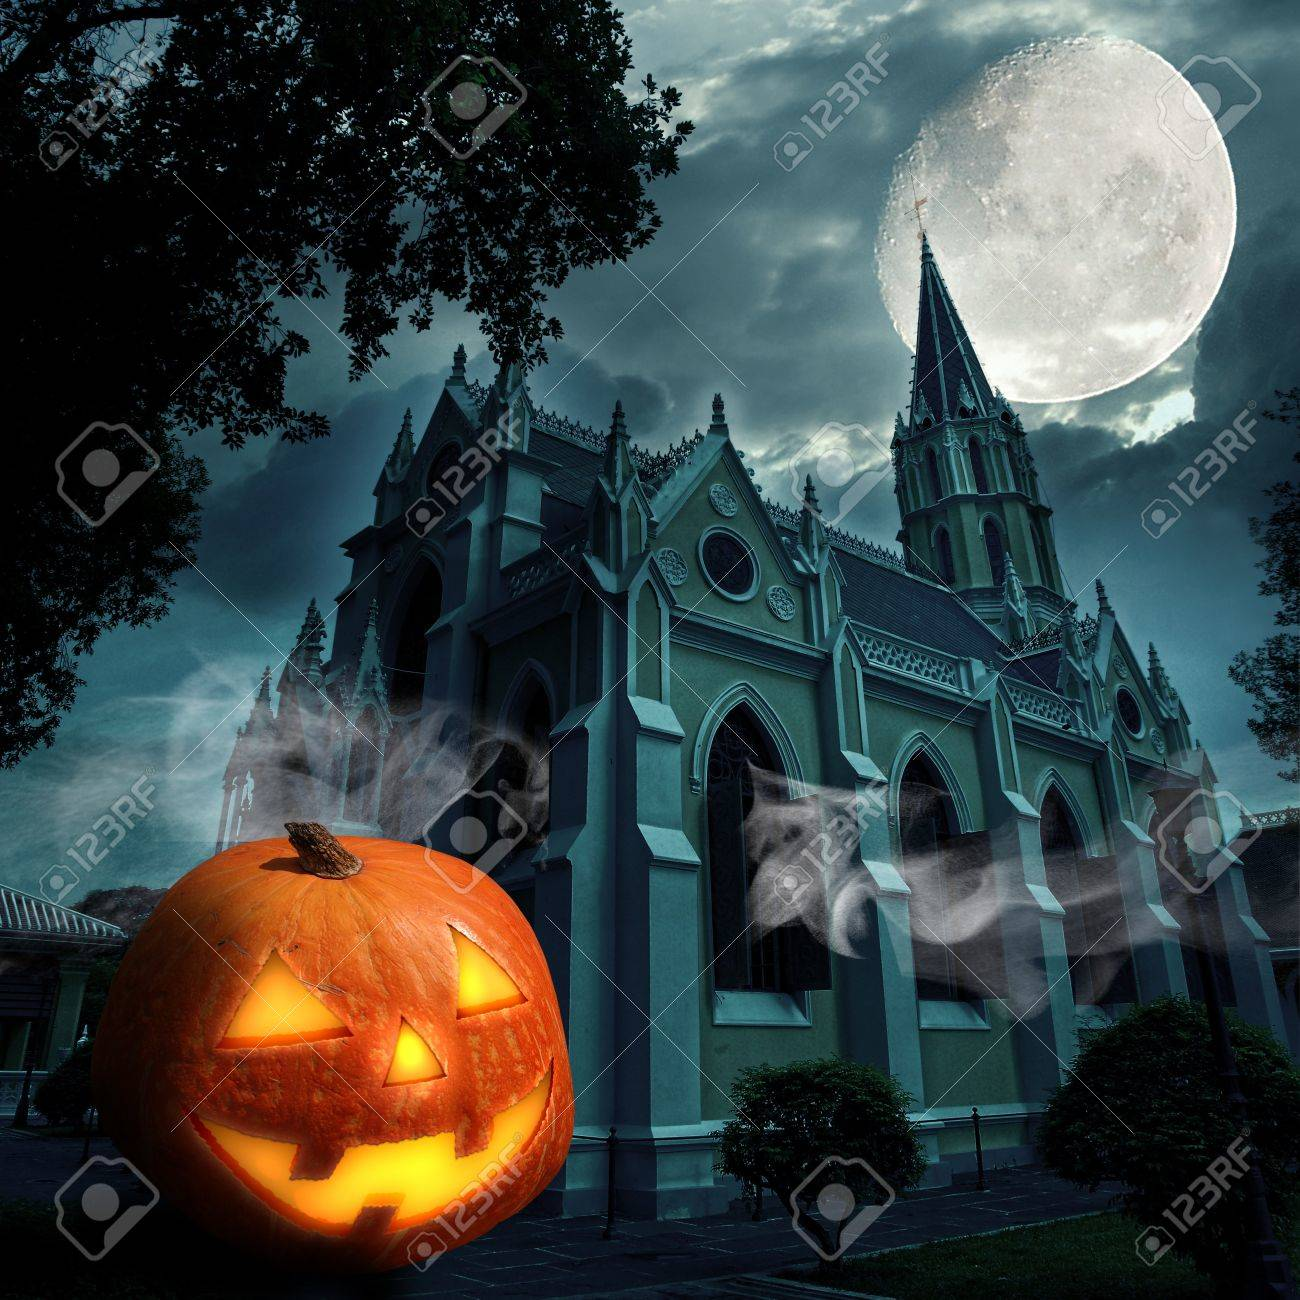 scary halloween pumpkin jack o lantern candle lit at church stock photo 10798211